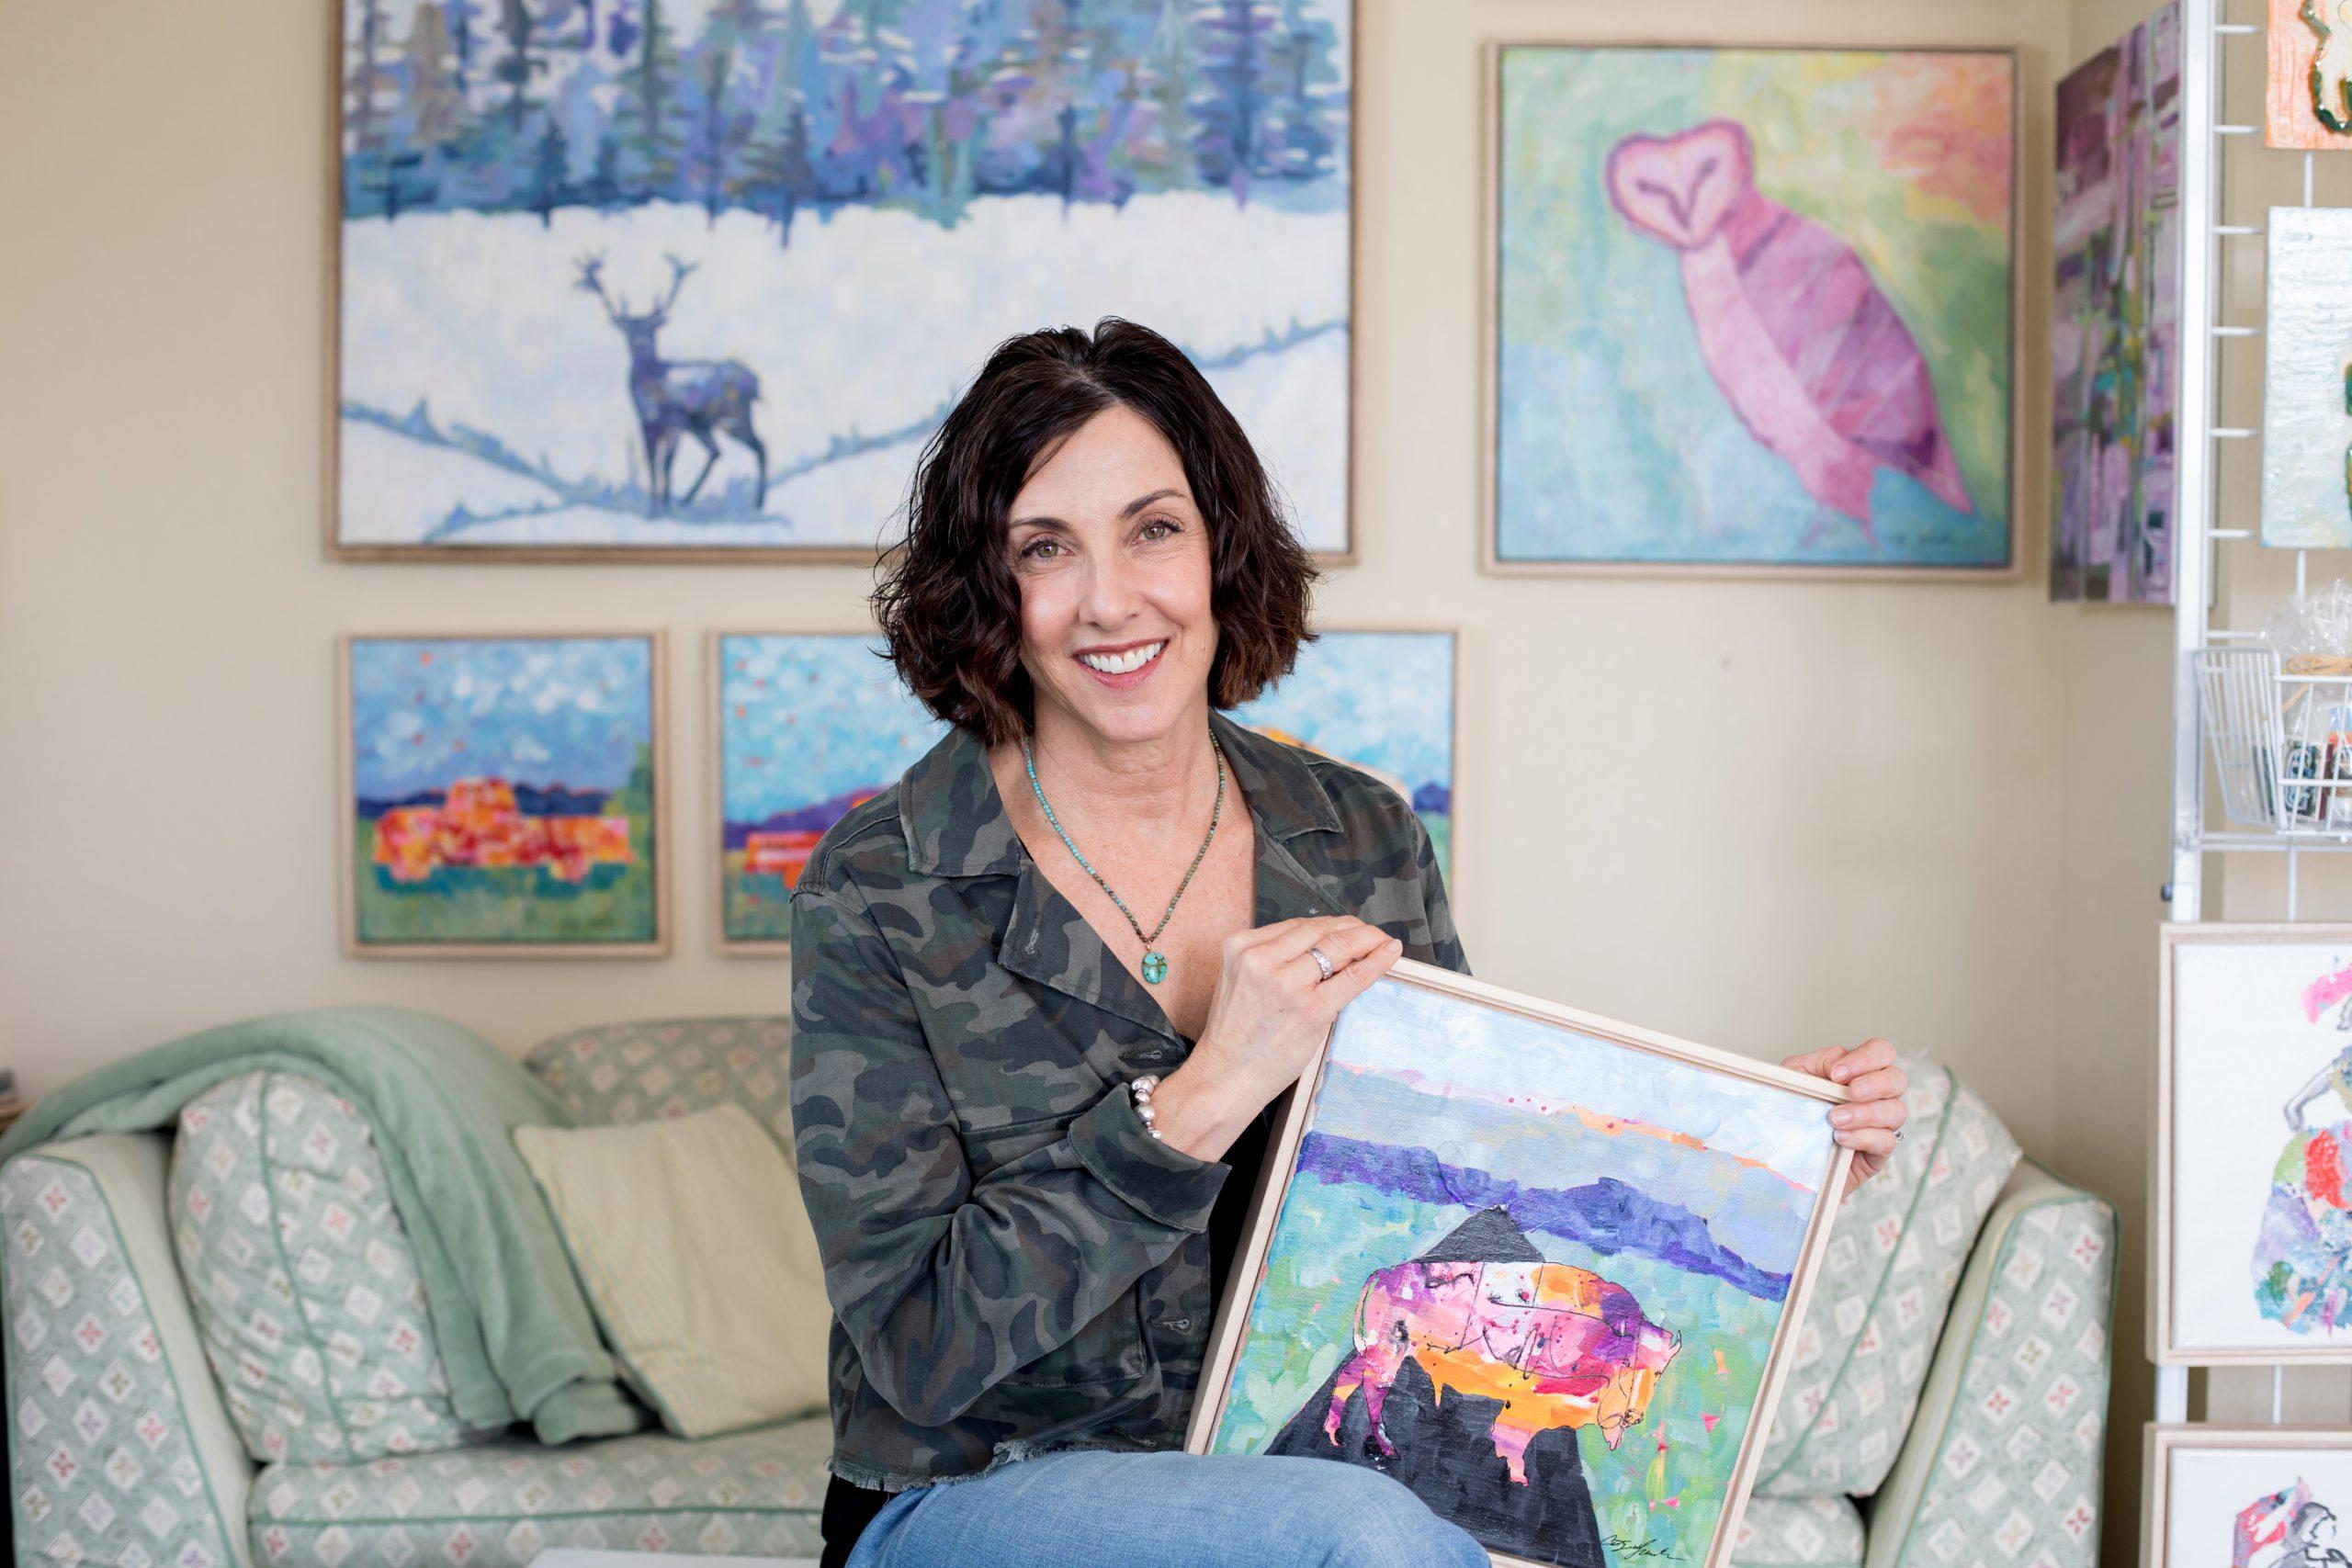 JUNE FEATURED ARTIST: Cathy Faughnan